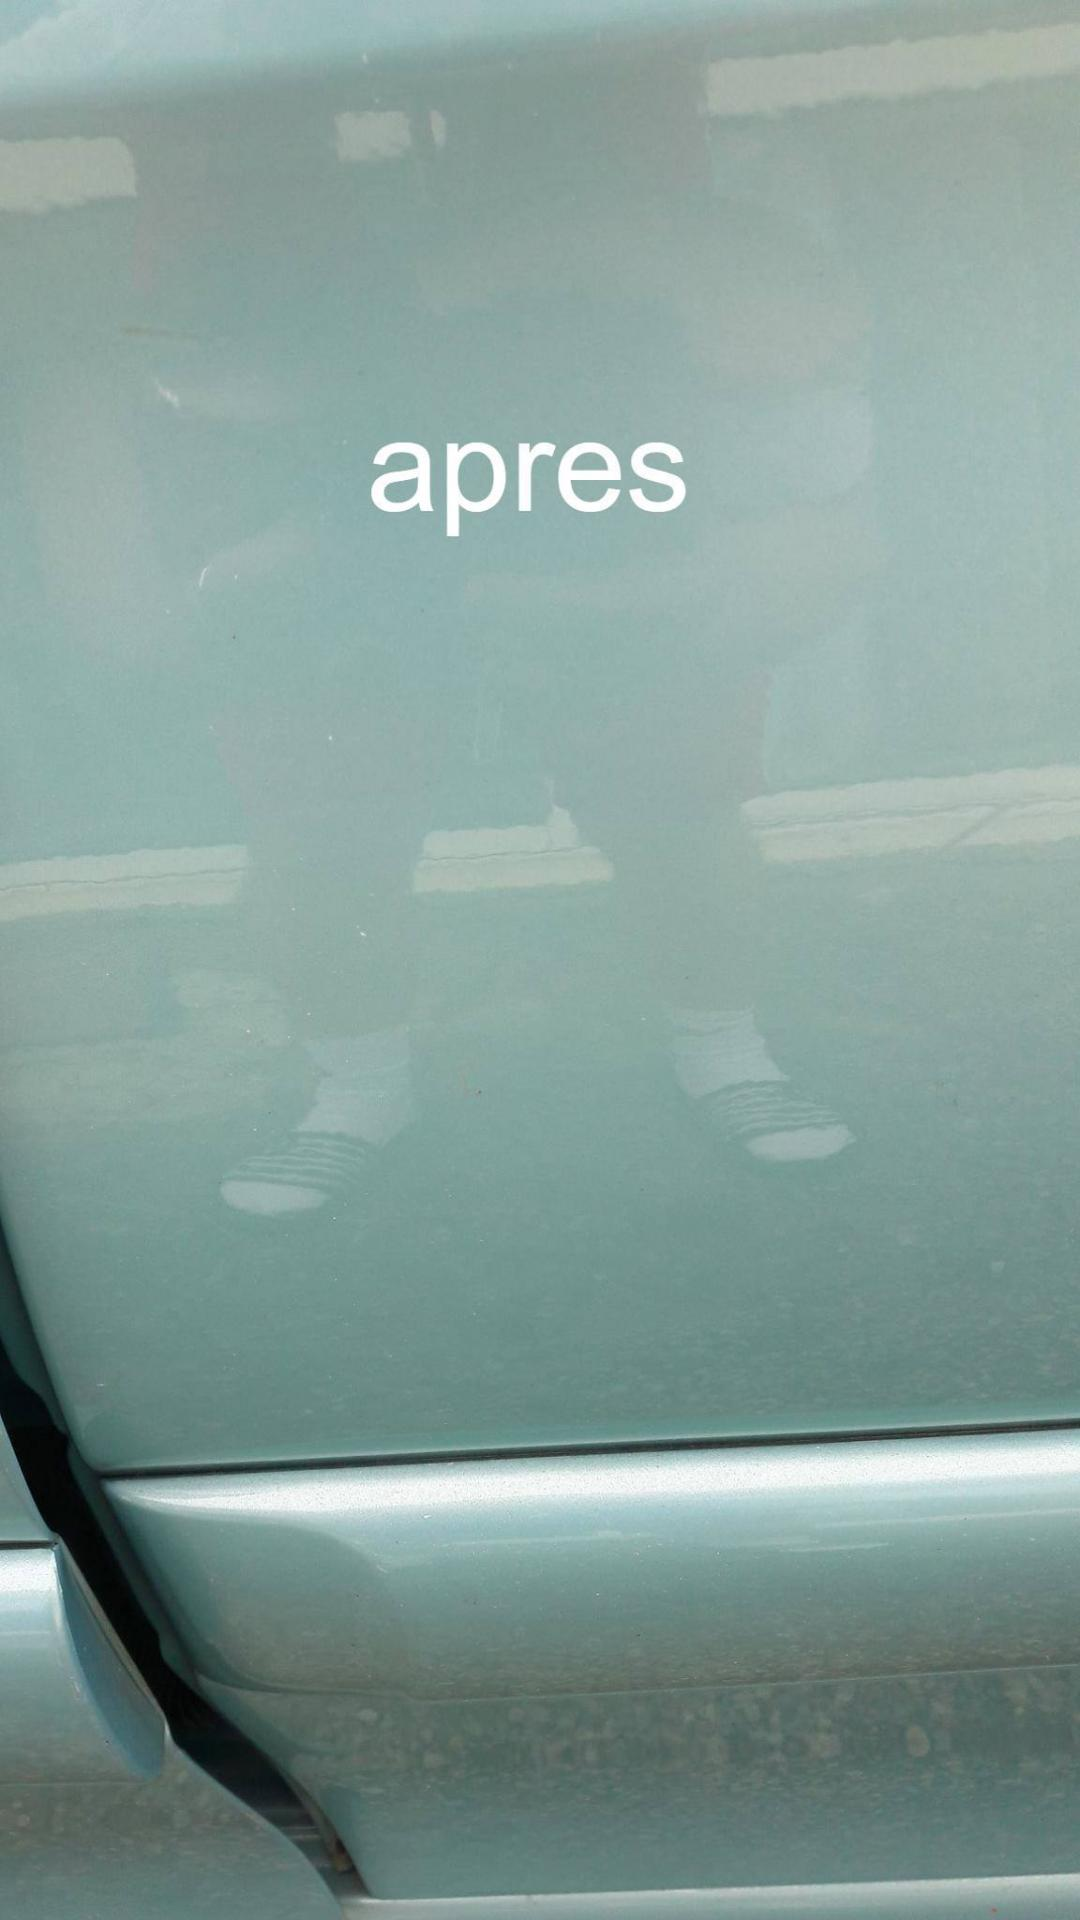 http://www.vivre-a-falvy.fr/medias/images/photo-8.jpg